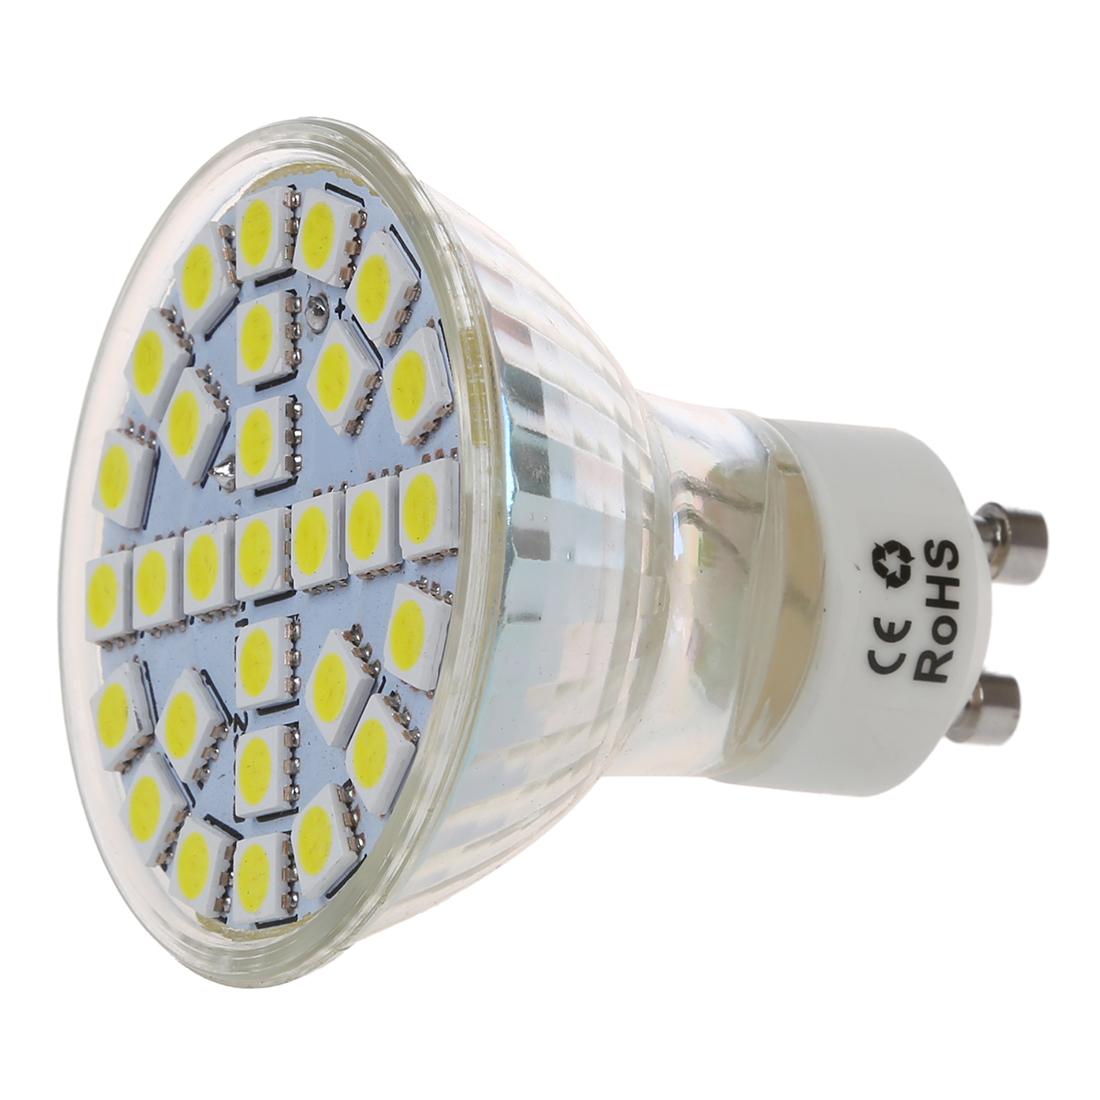 gu10 5w 29 led 5050 smd ampoule spotlight lampe spot bulb lumiere blanc 220 j4u5 ebay. Black Bedroom Furniture Sets. Home Design Ideas